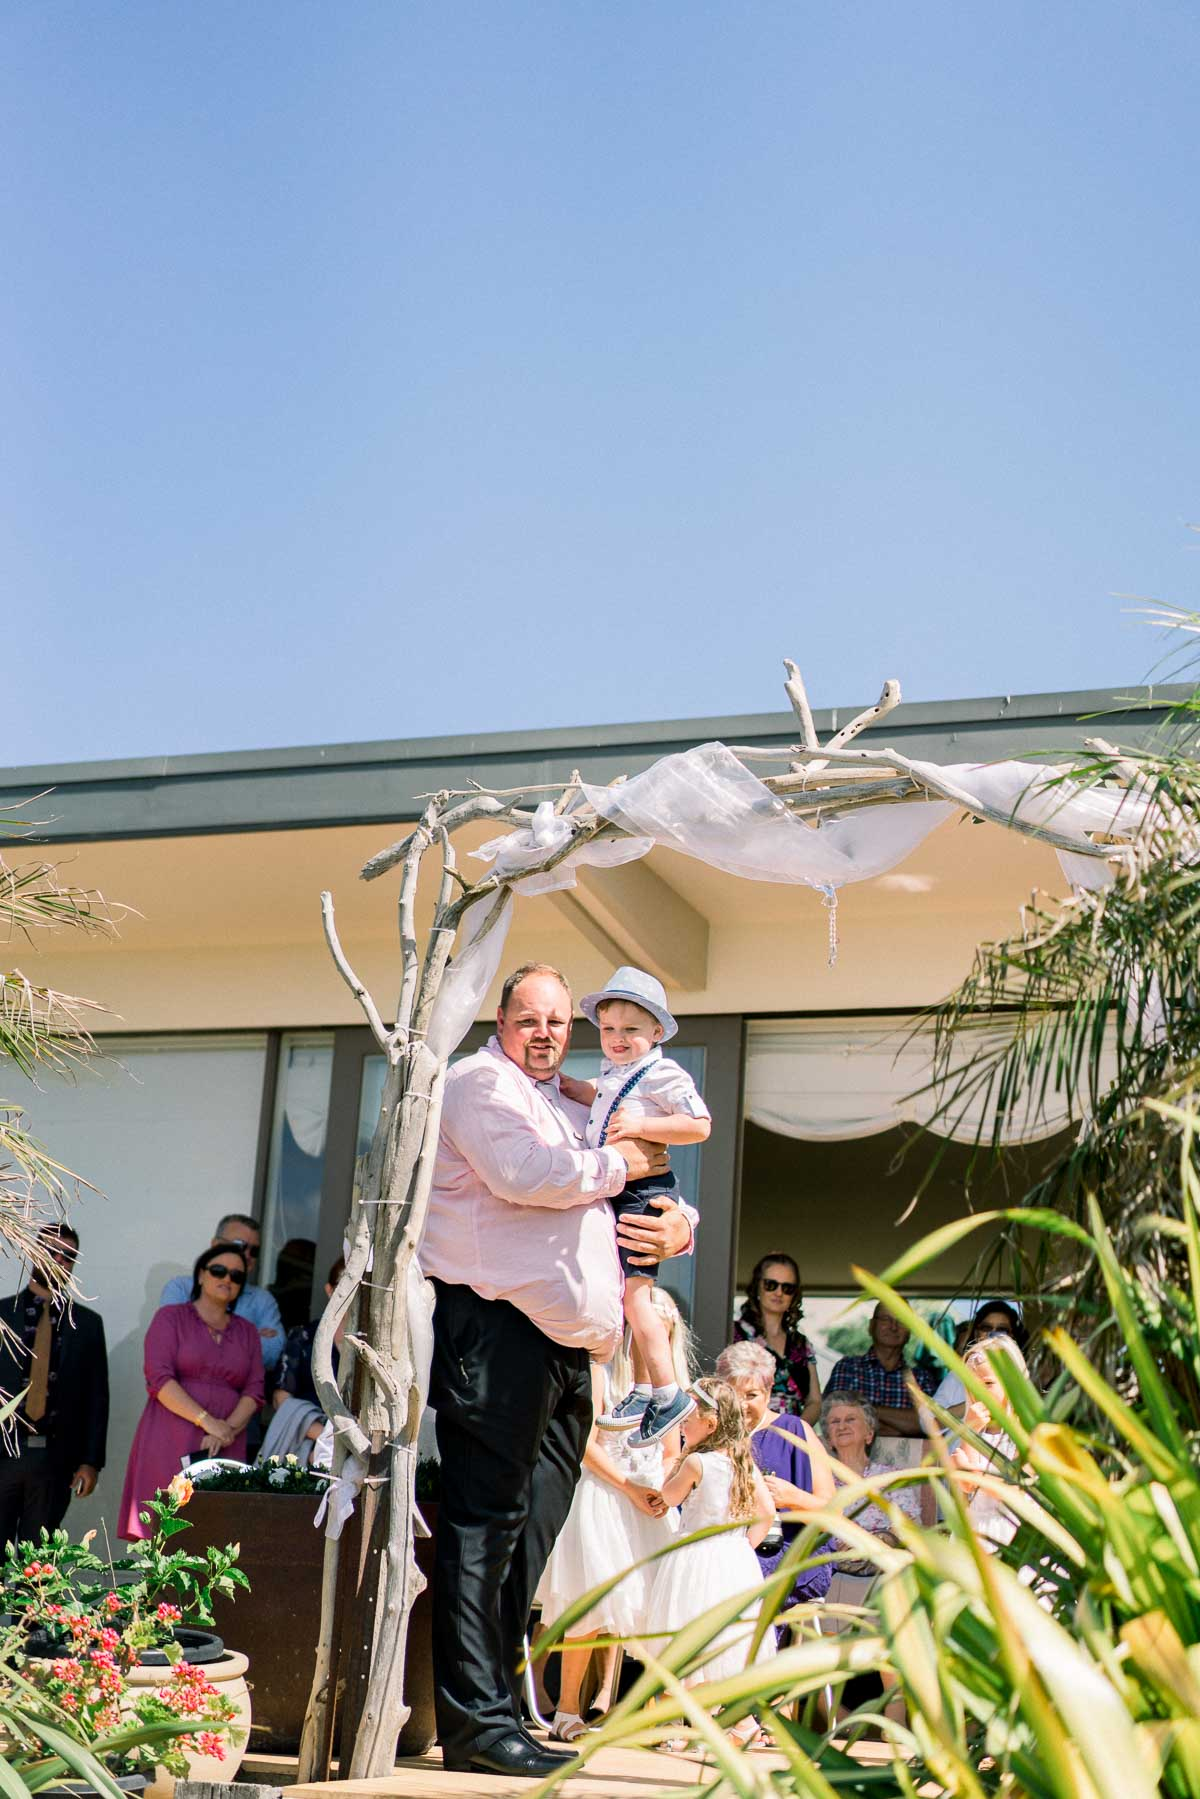 mt-eliza-mornington-peninsula-backyard-wedding-heart+soul-weddings-allison-matt-03170.jpg